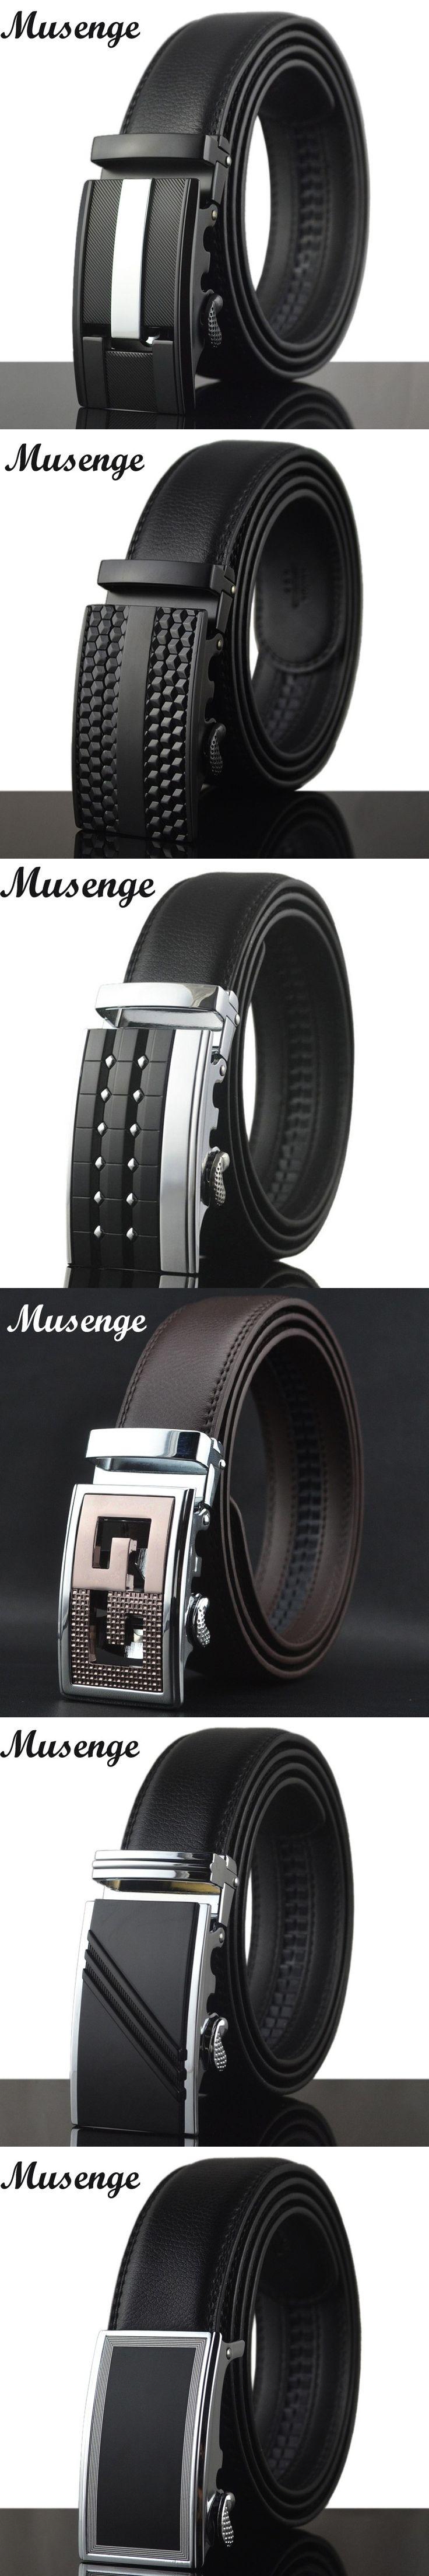 Belt Designer Belts Men High Quality Leather Belt Men Ceinture Homme Cinturones Hombre Mens Belts Luxury Cinto Cinturon Riem For $16.38